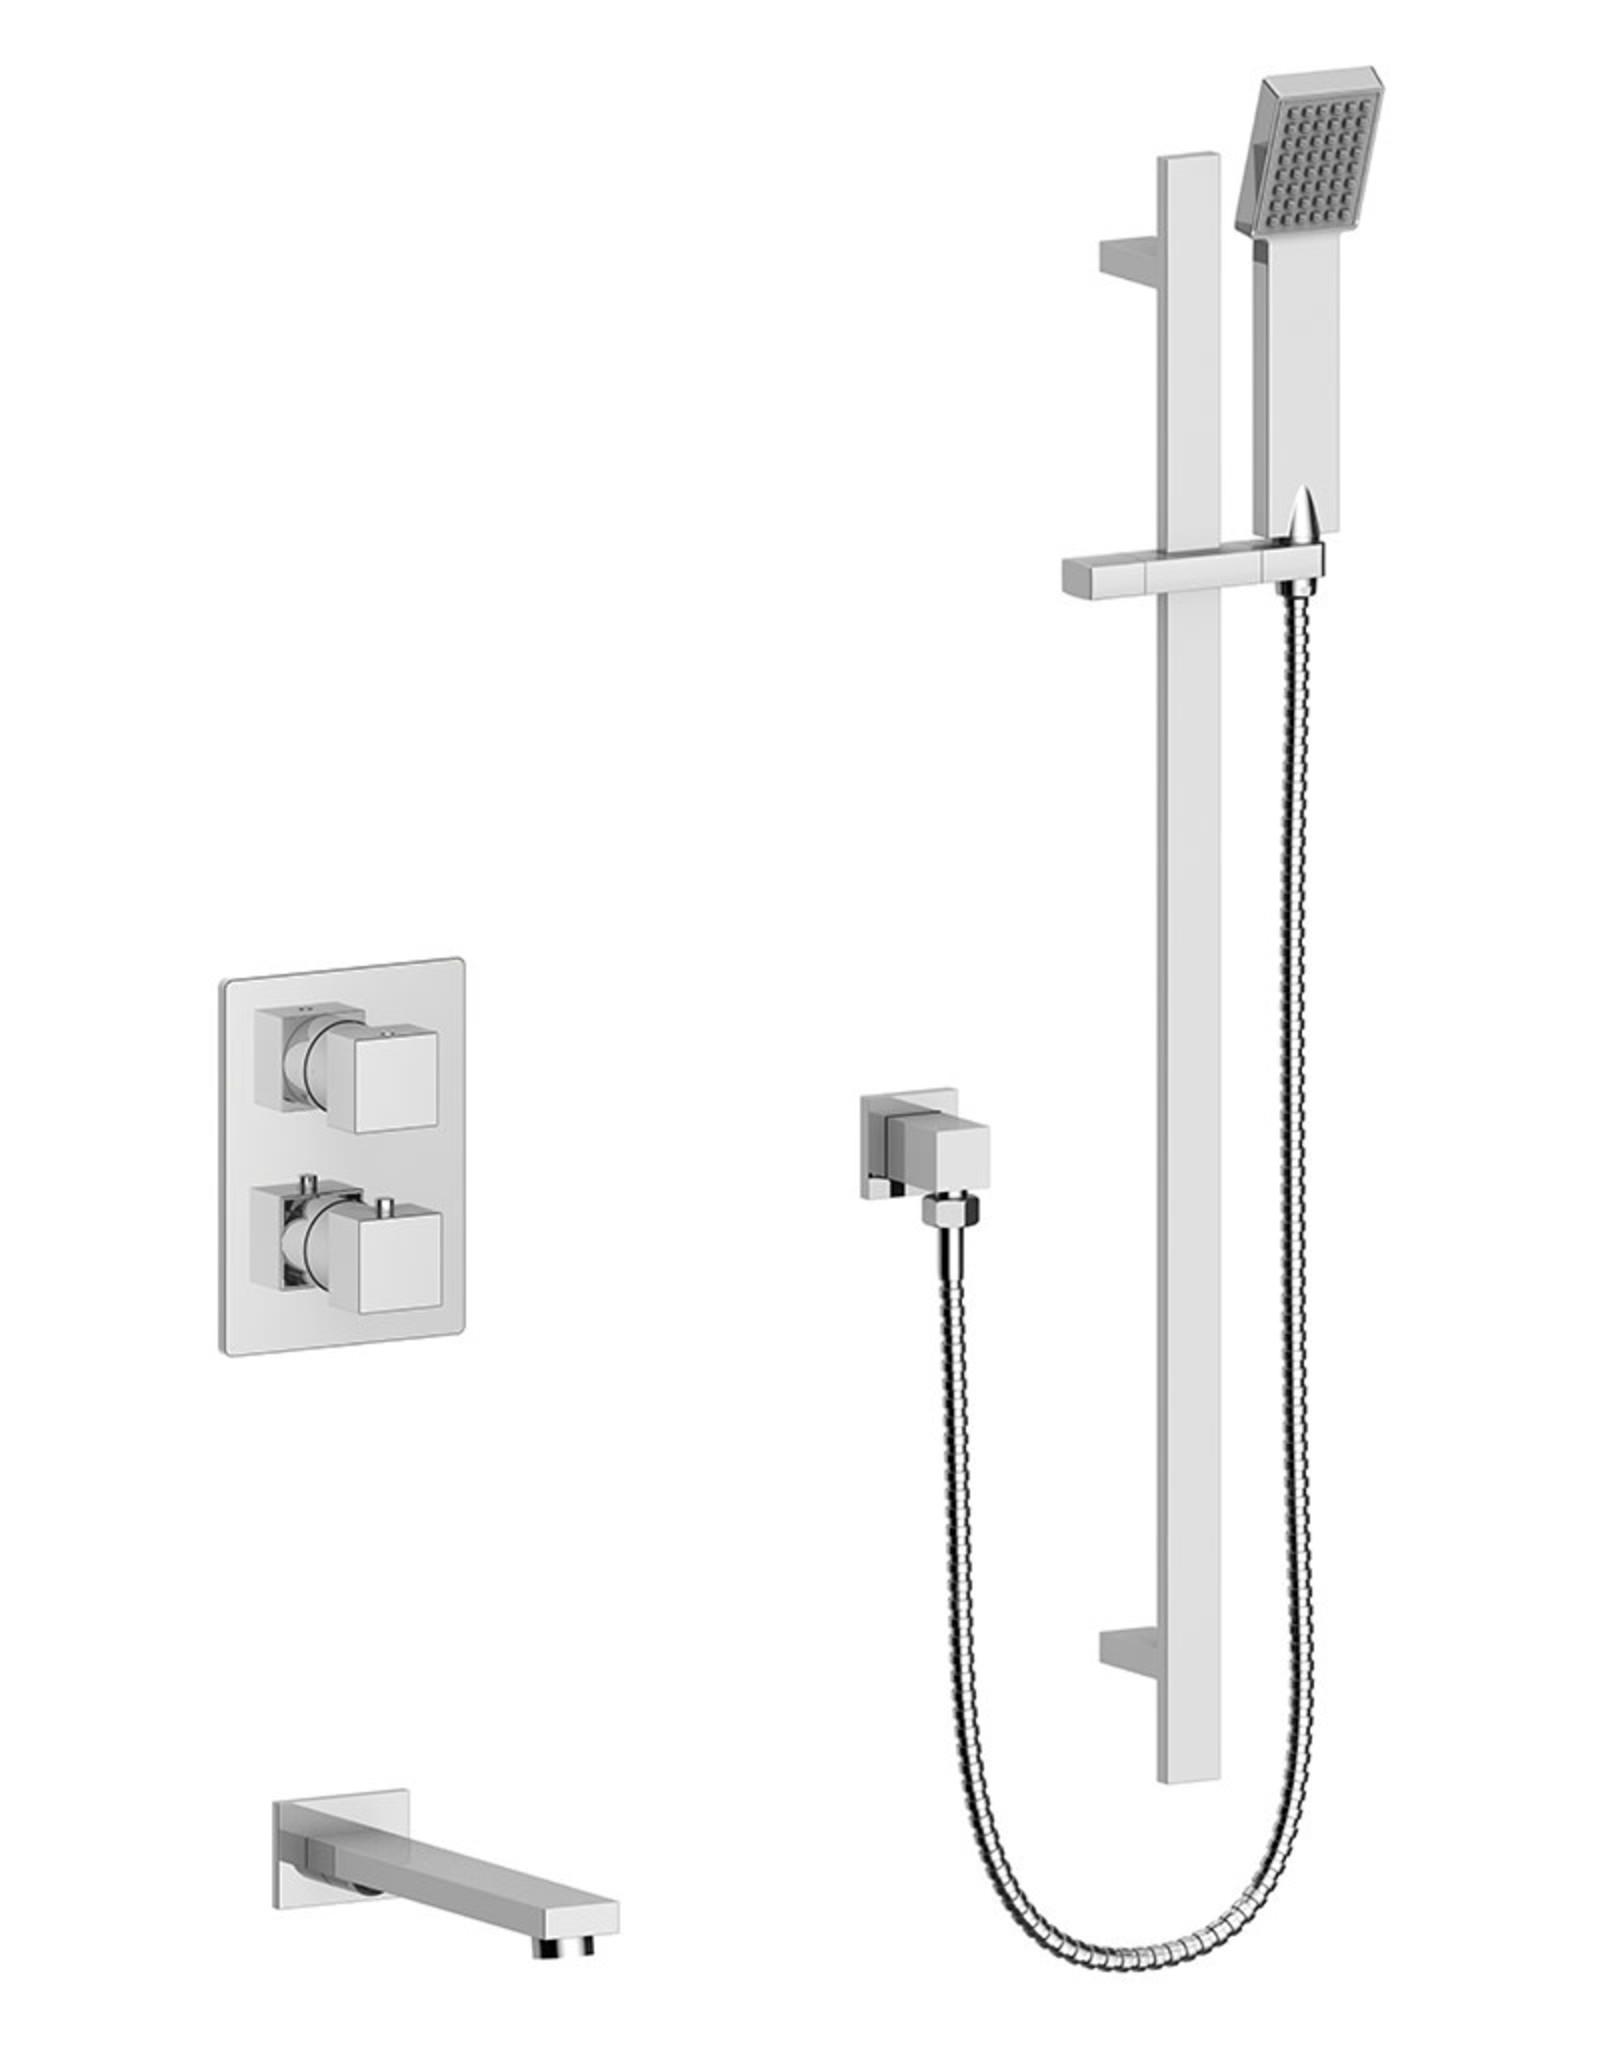 Vogt Kapfenberg- 2-Way Thermostatic Shower Kit- Chrome